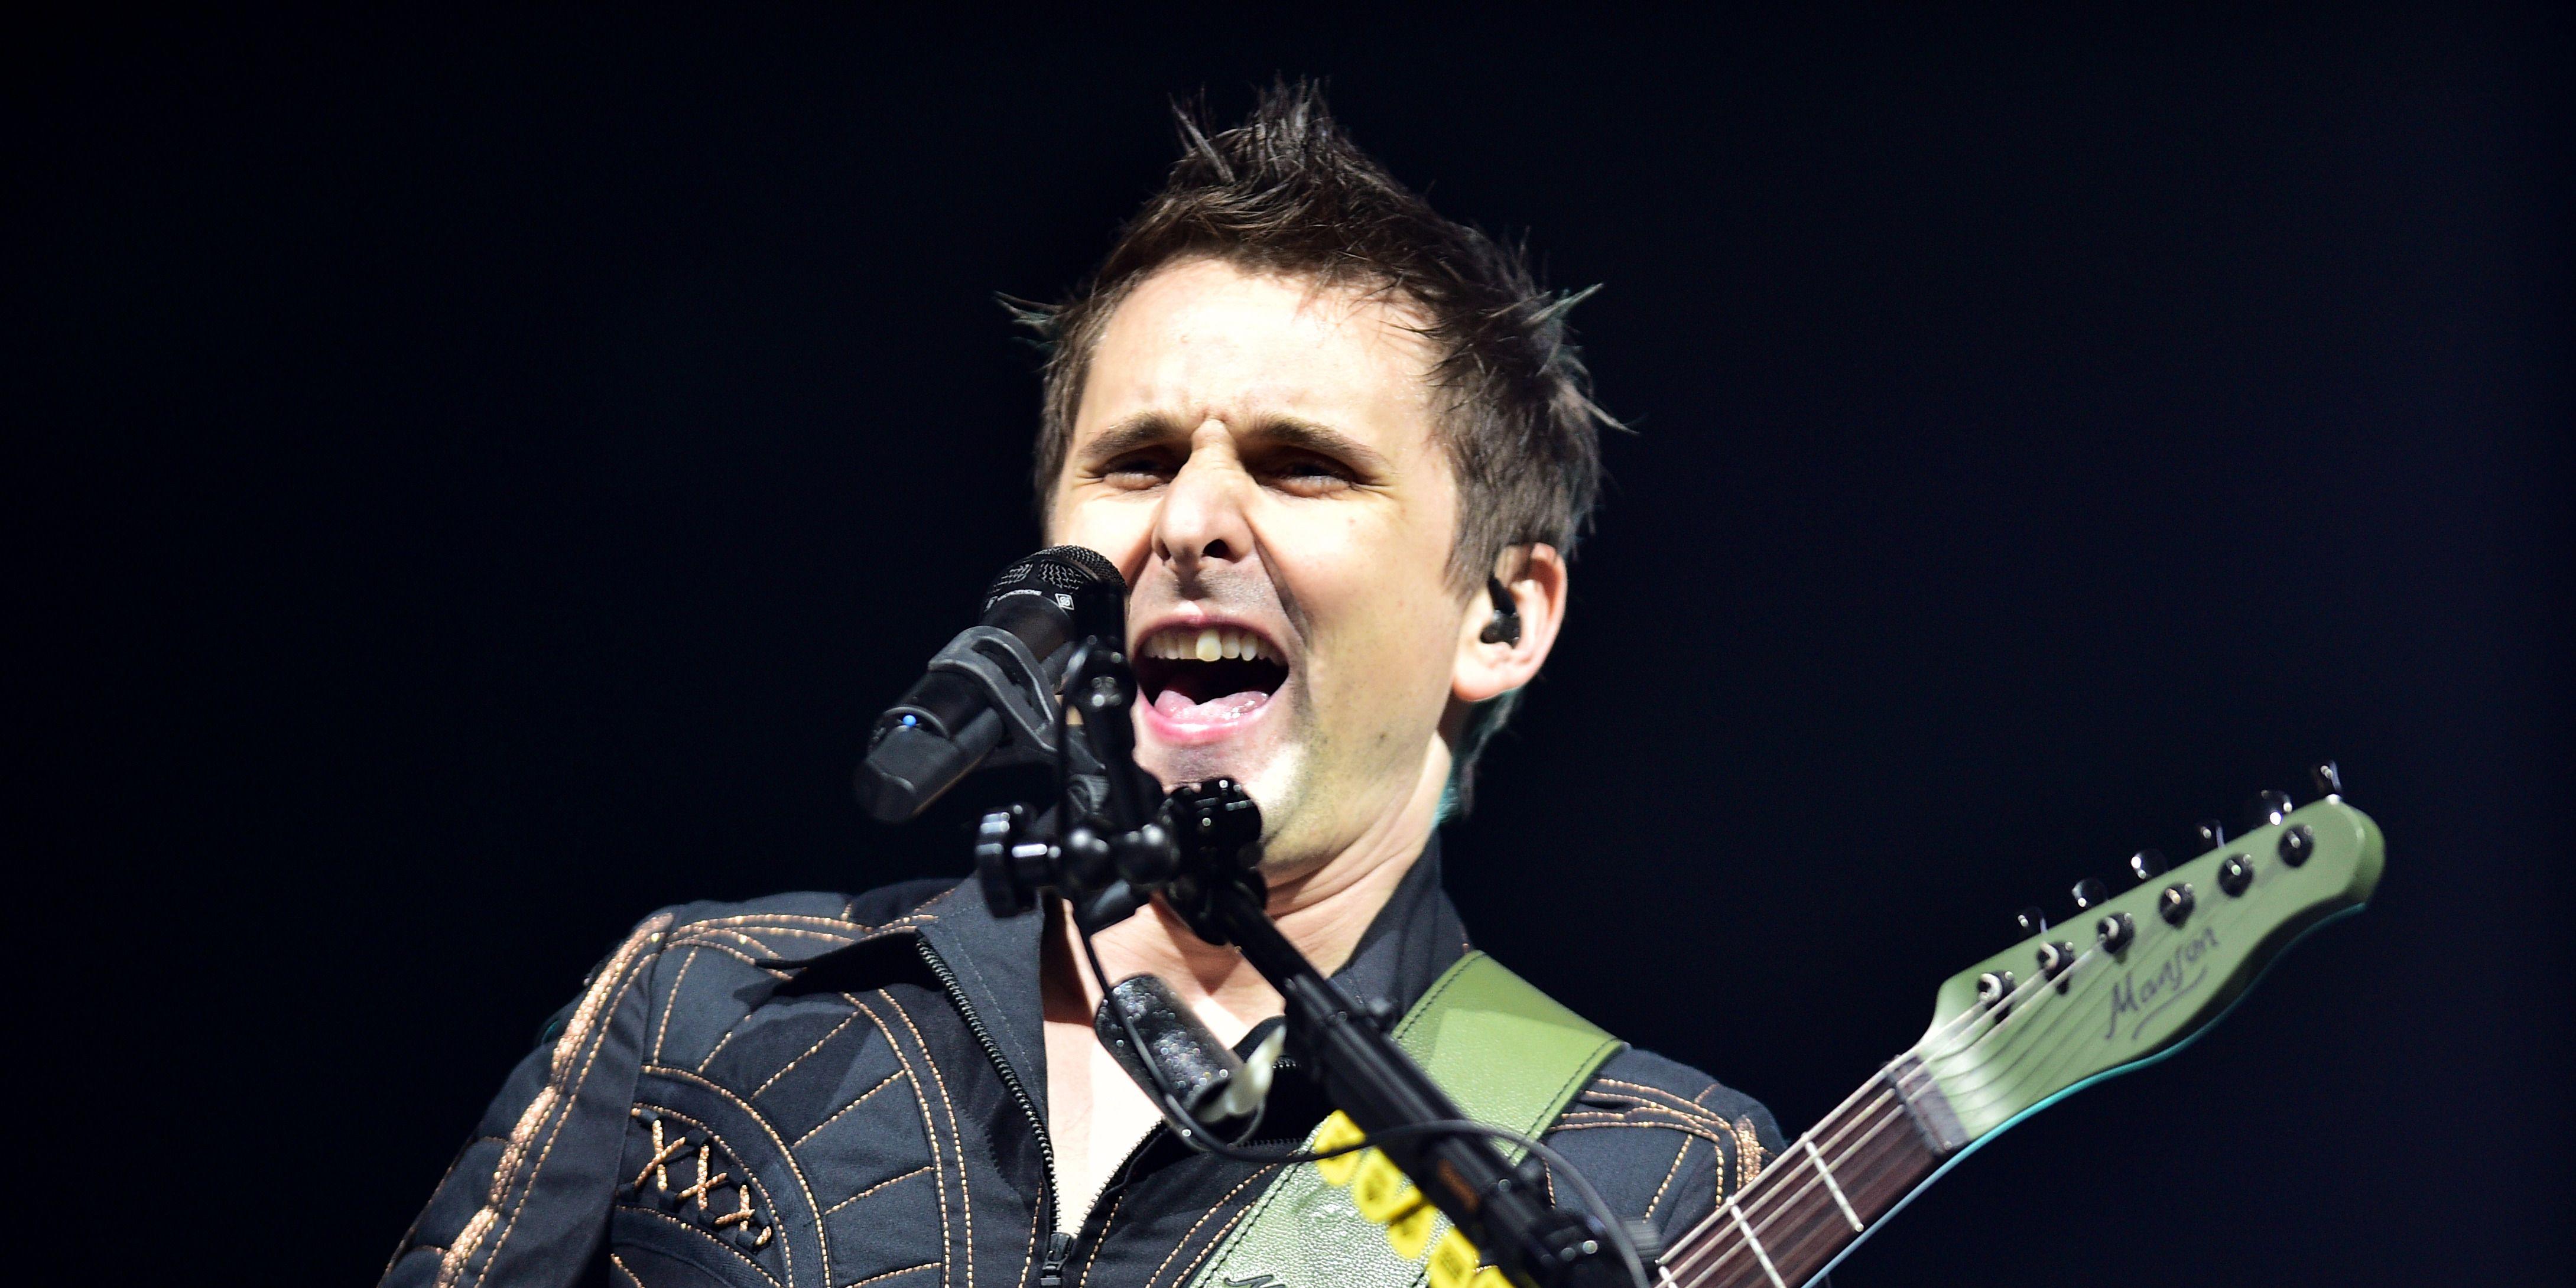 Muse at Glastonbury 2016